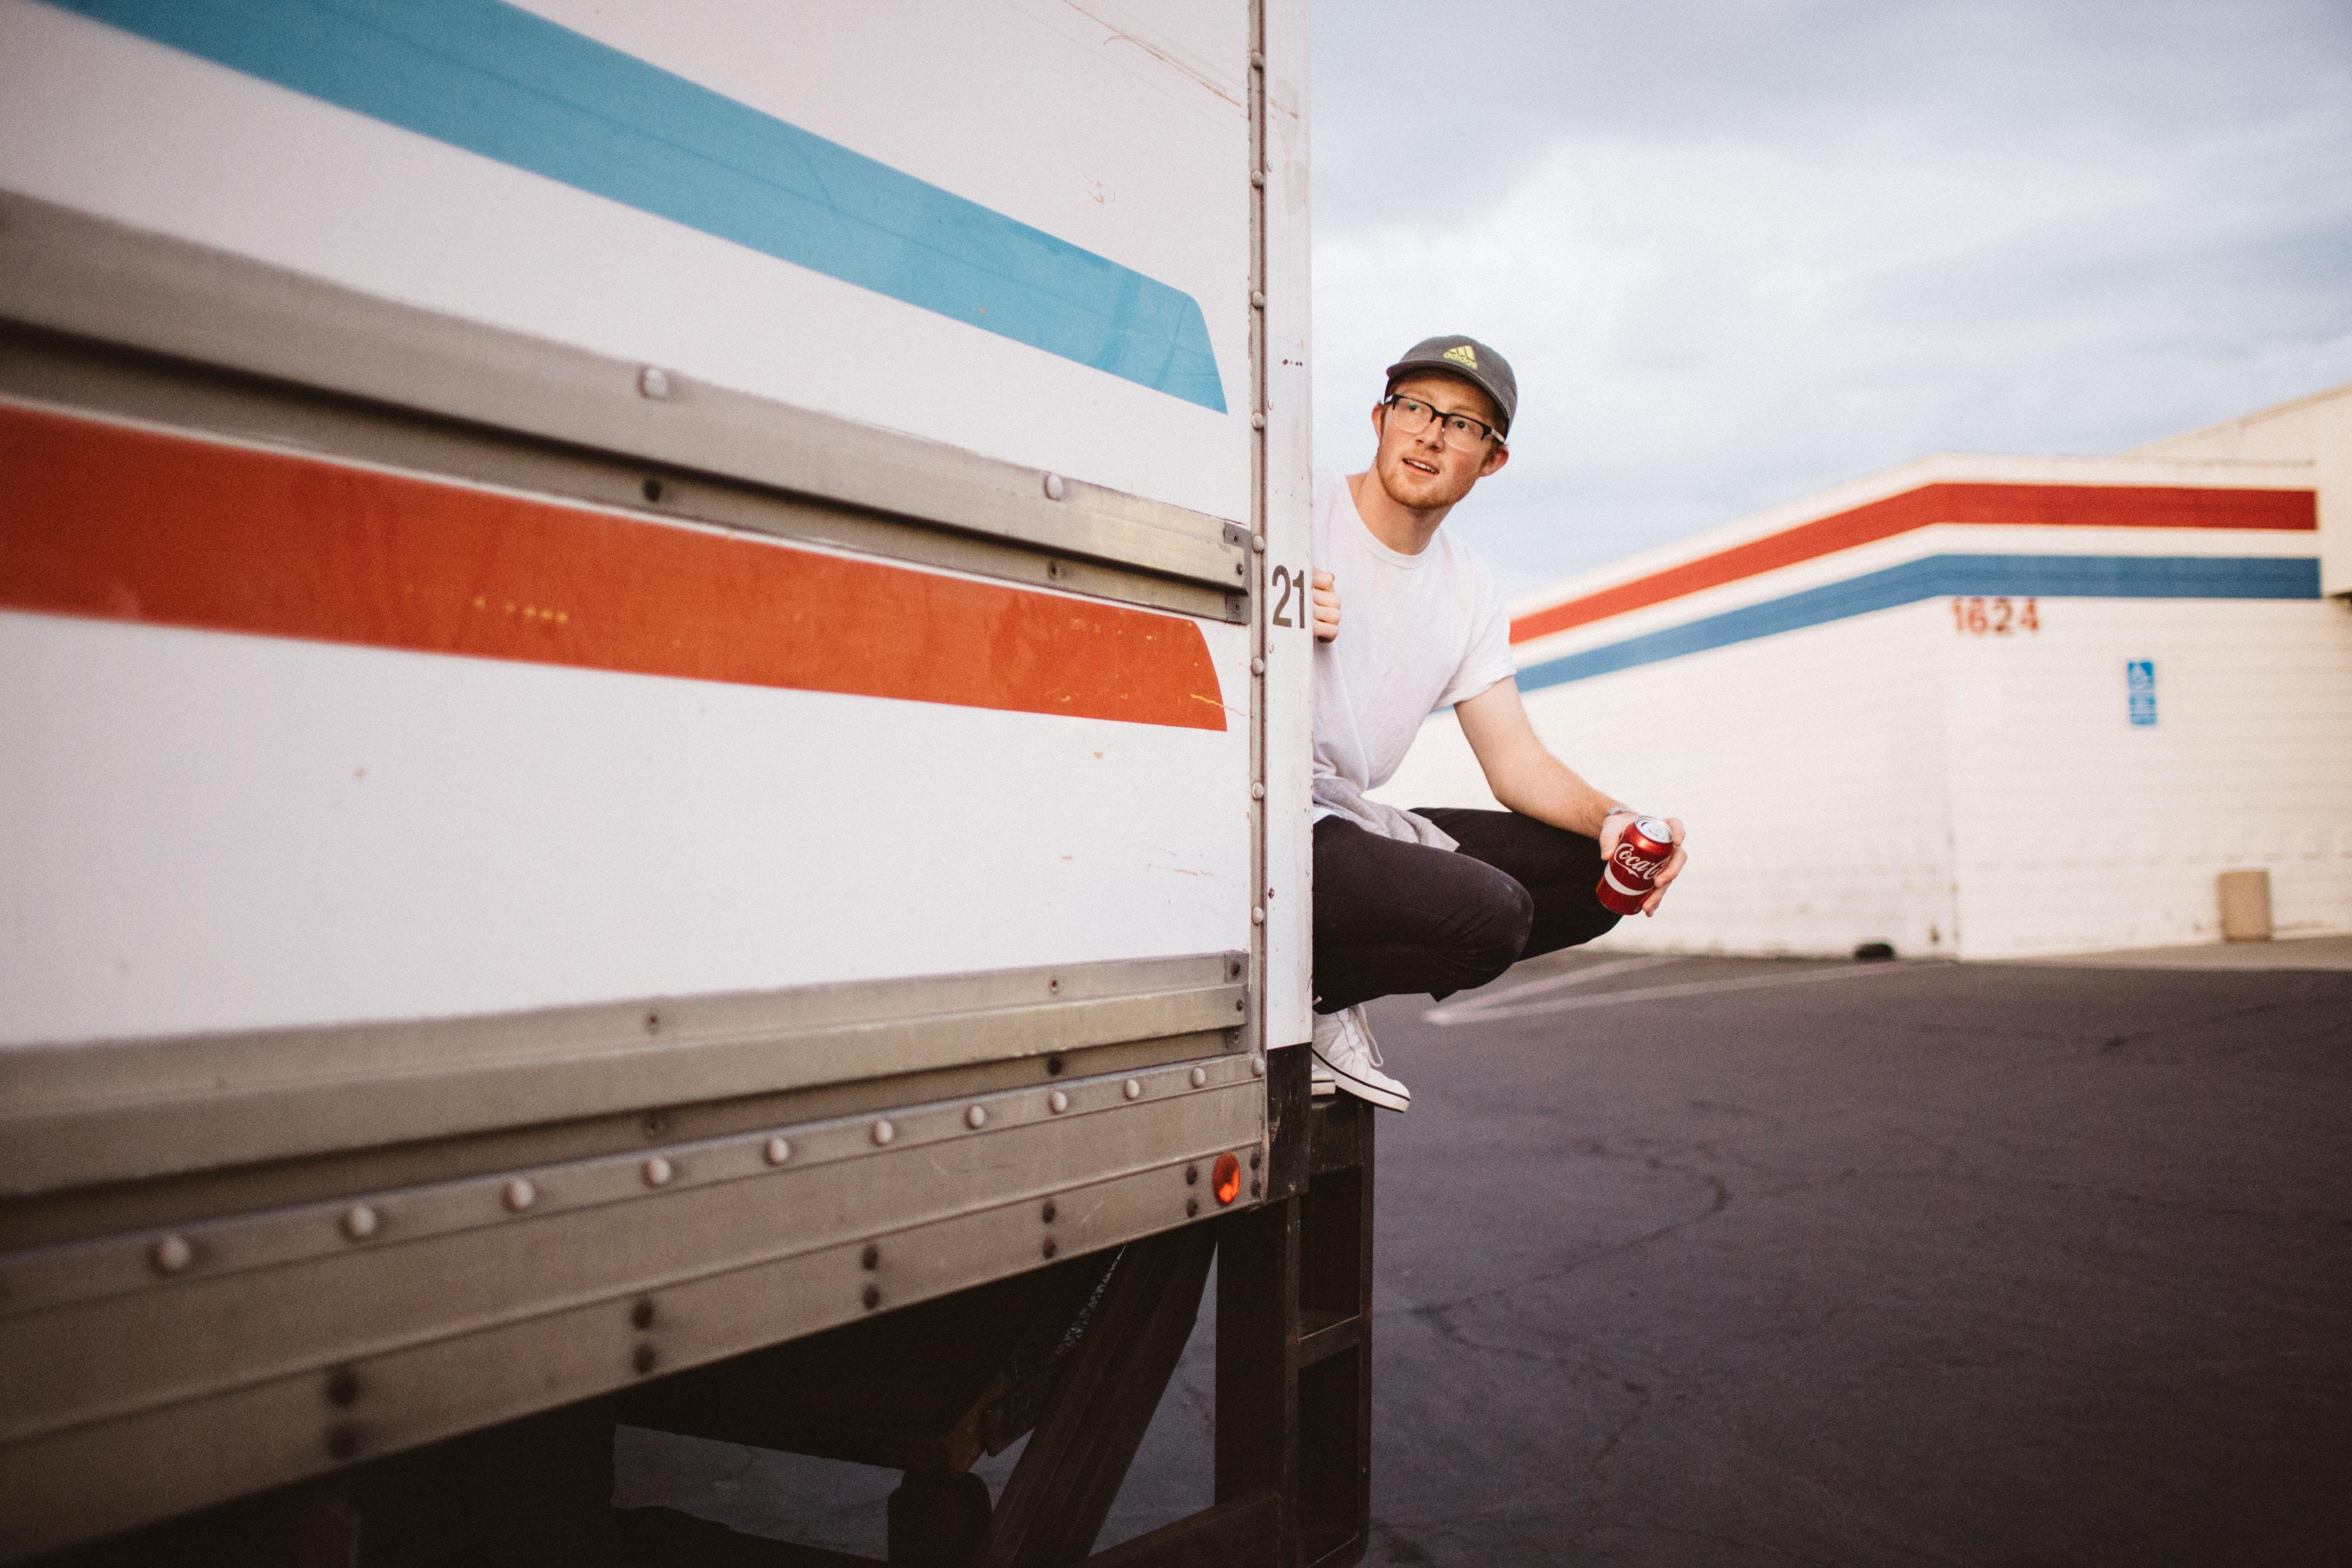 man on truck during daytime